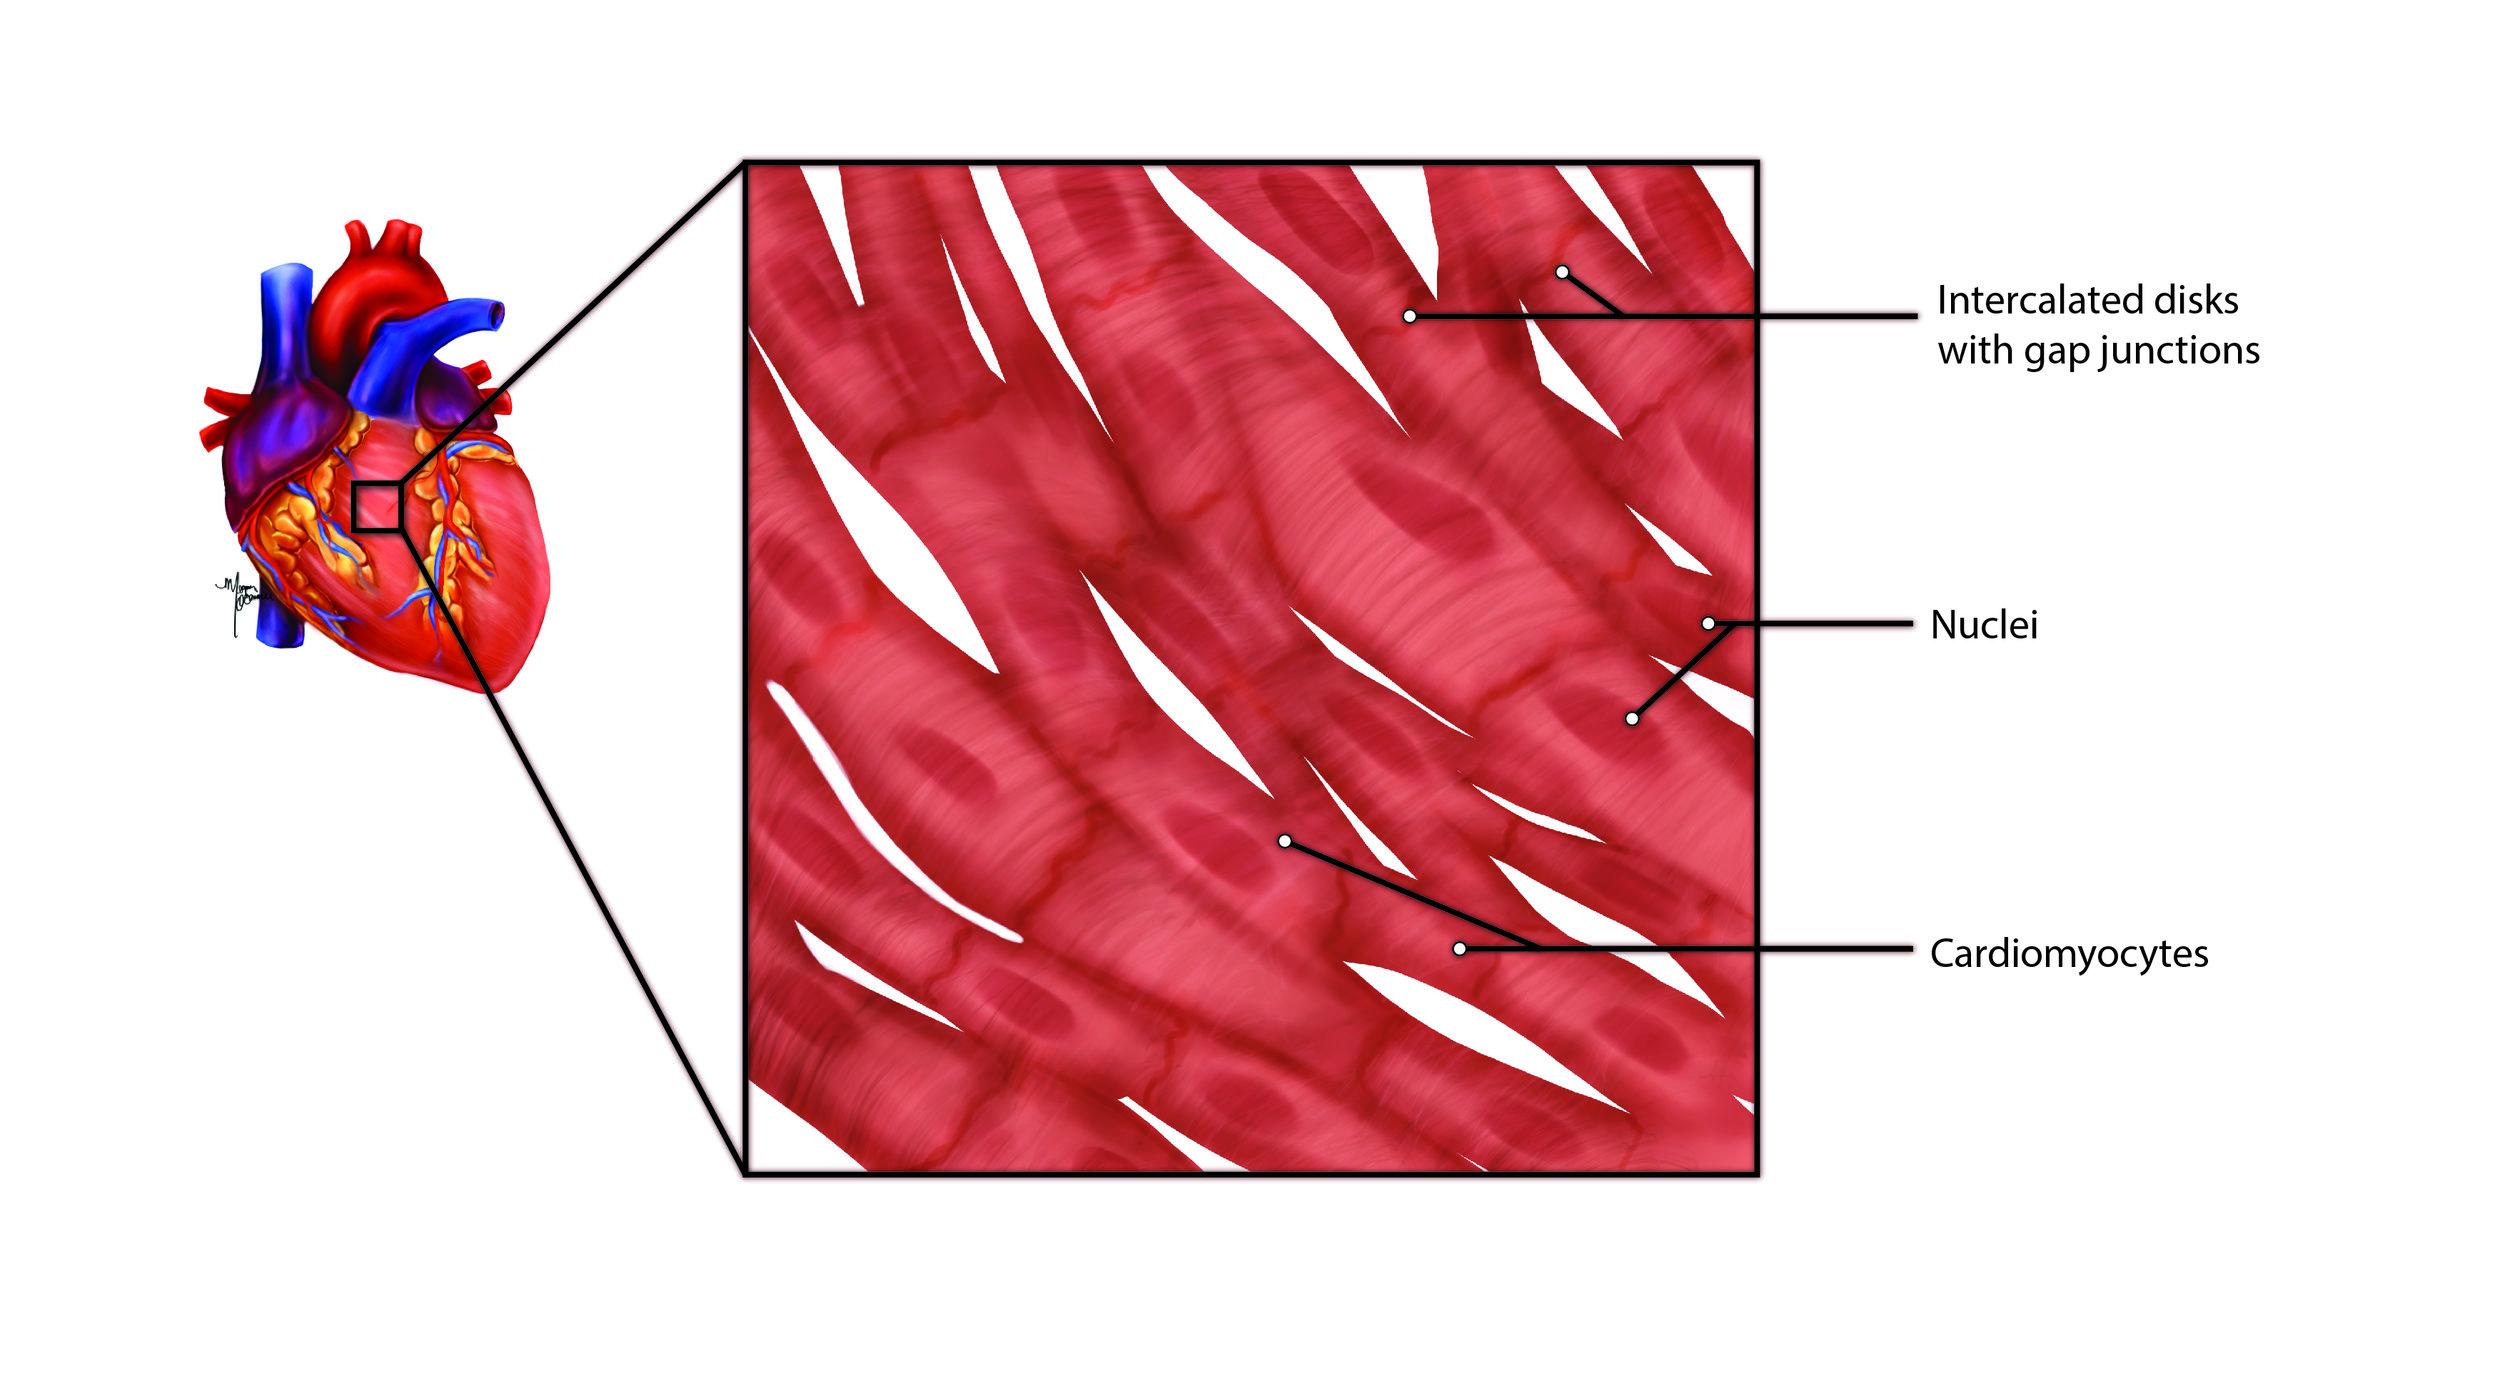 Cardiomyocytes - Learn More